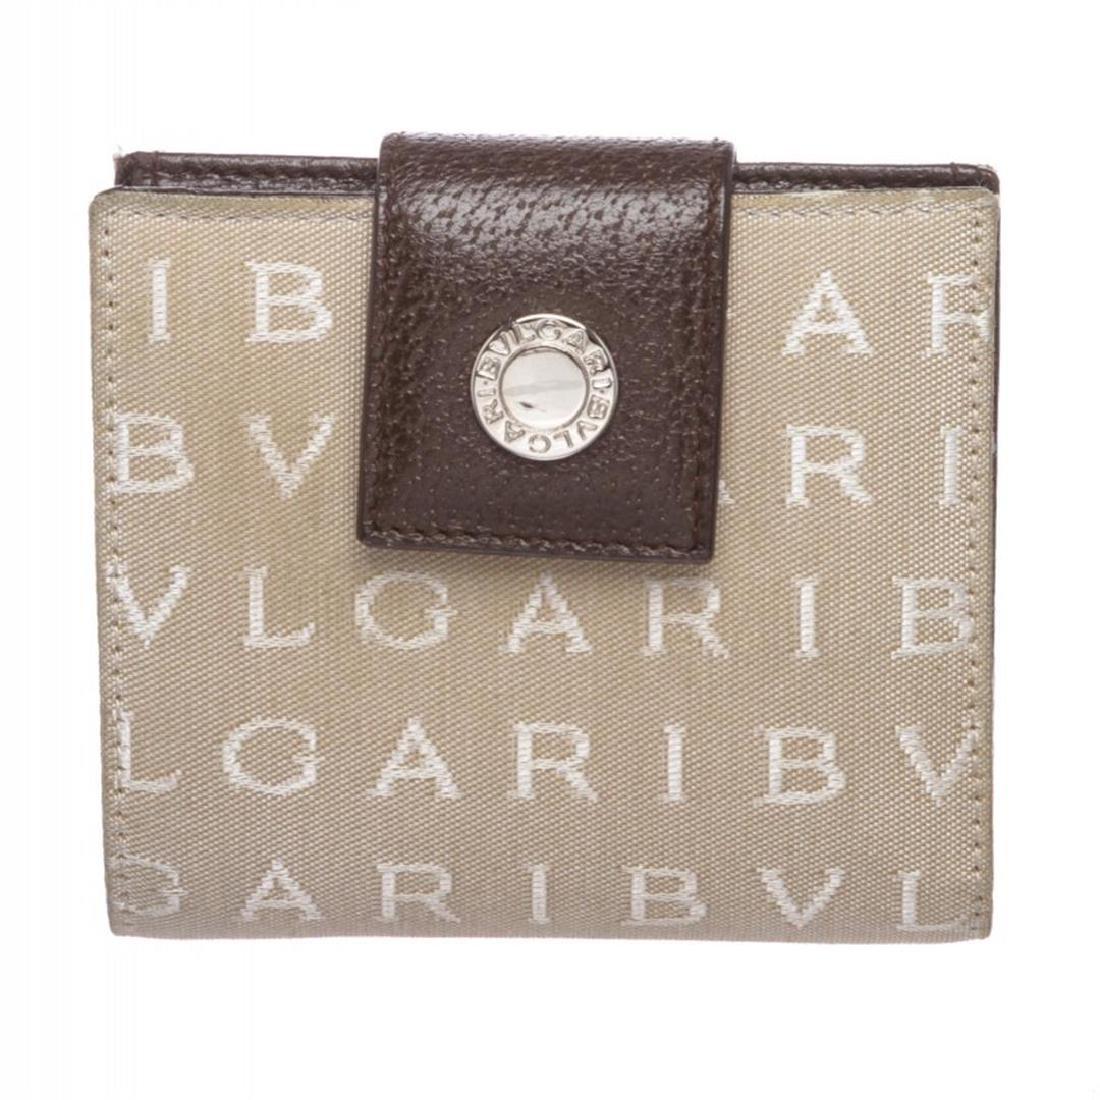 Bvlgari Beige Monogram Fabric Bi Fold Small Wallet